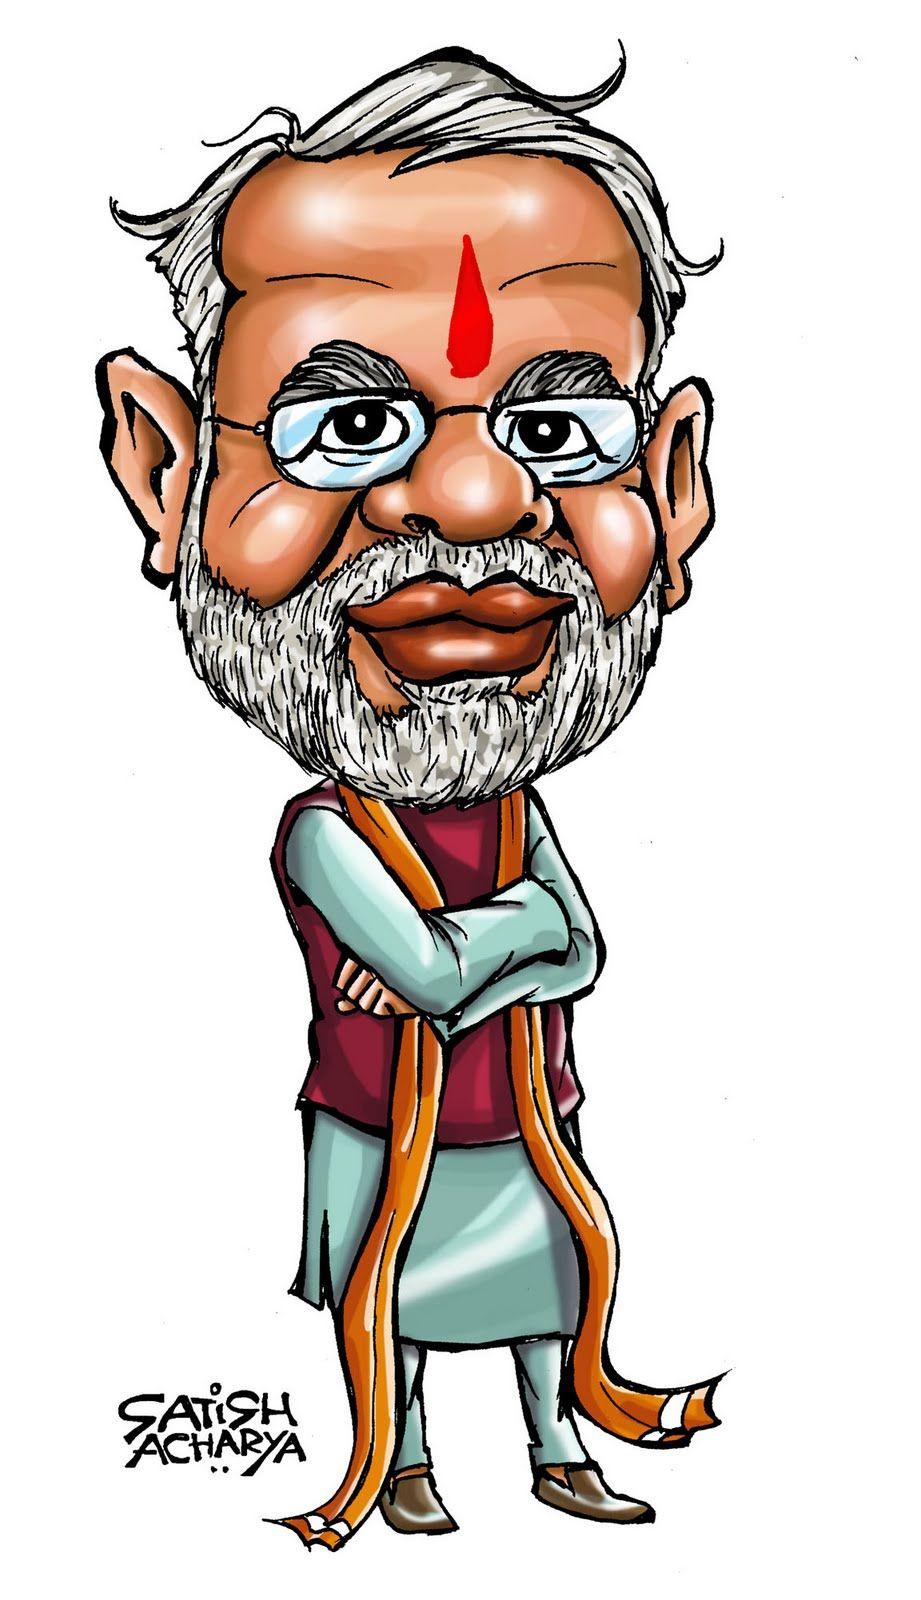 Narendra Modi Funny Cartoon Photos : narendra, funny, cartoon, photos, MYusuf, Advani, Caricatures, Politicians, Funny, Cartoon, Characters,, Caricature, Sketch,, Character, Tattoos